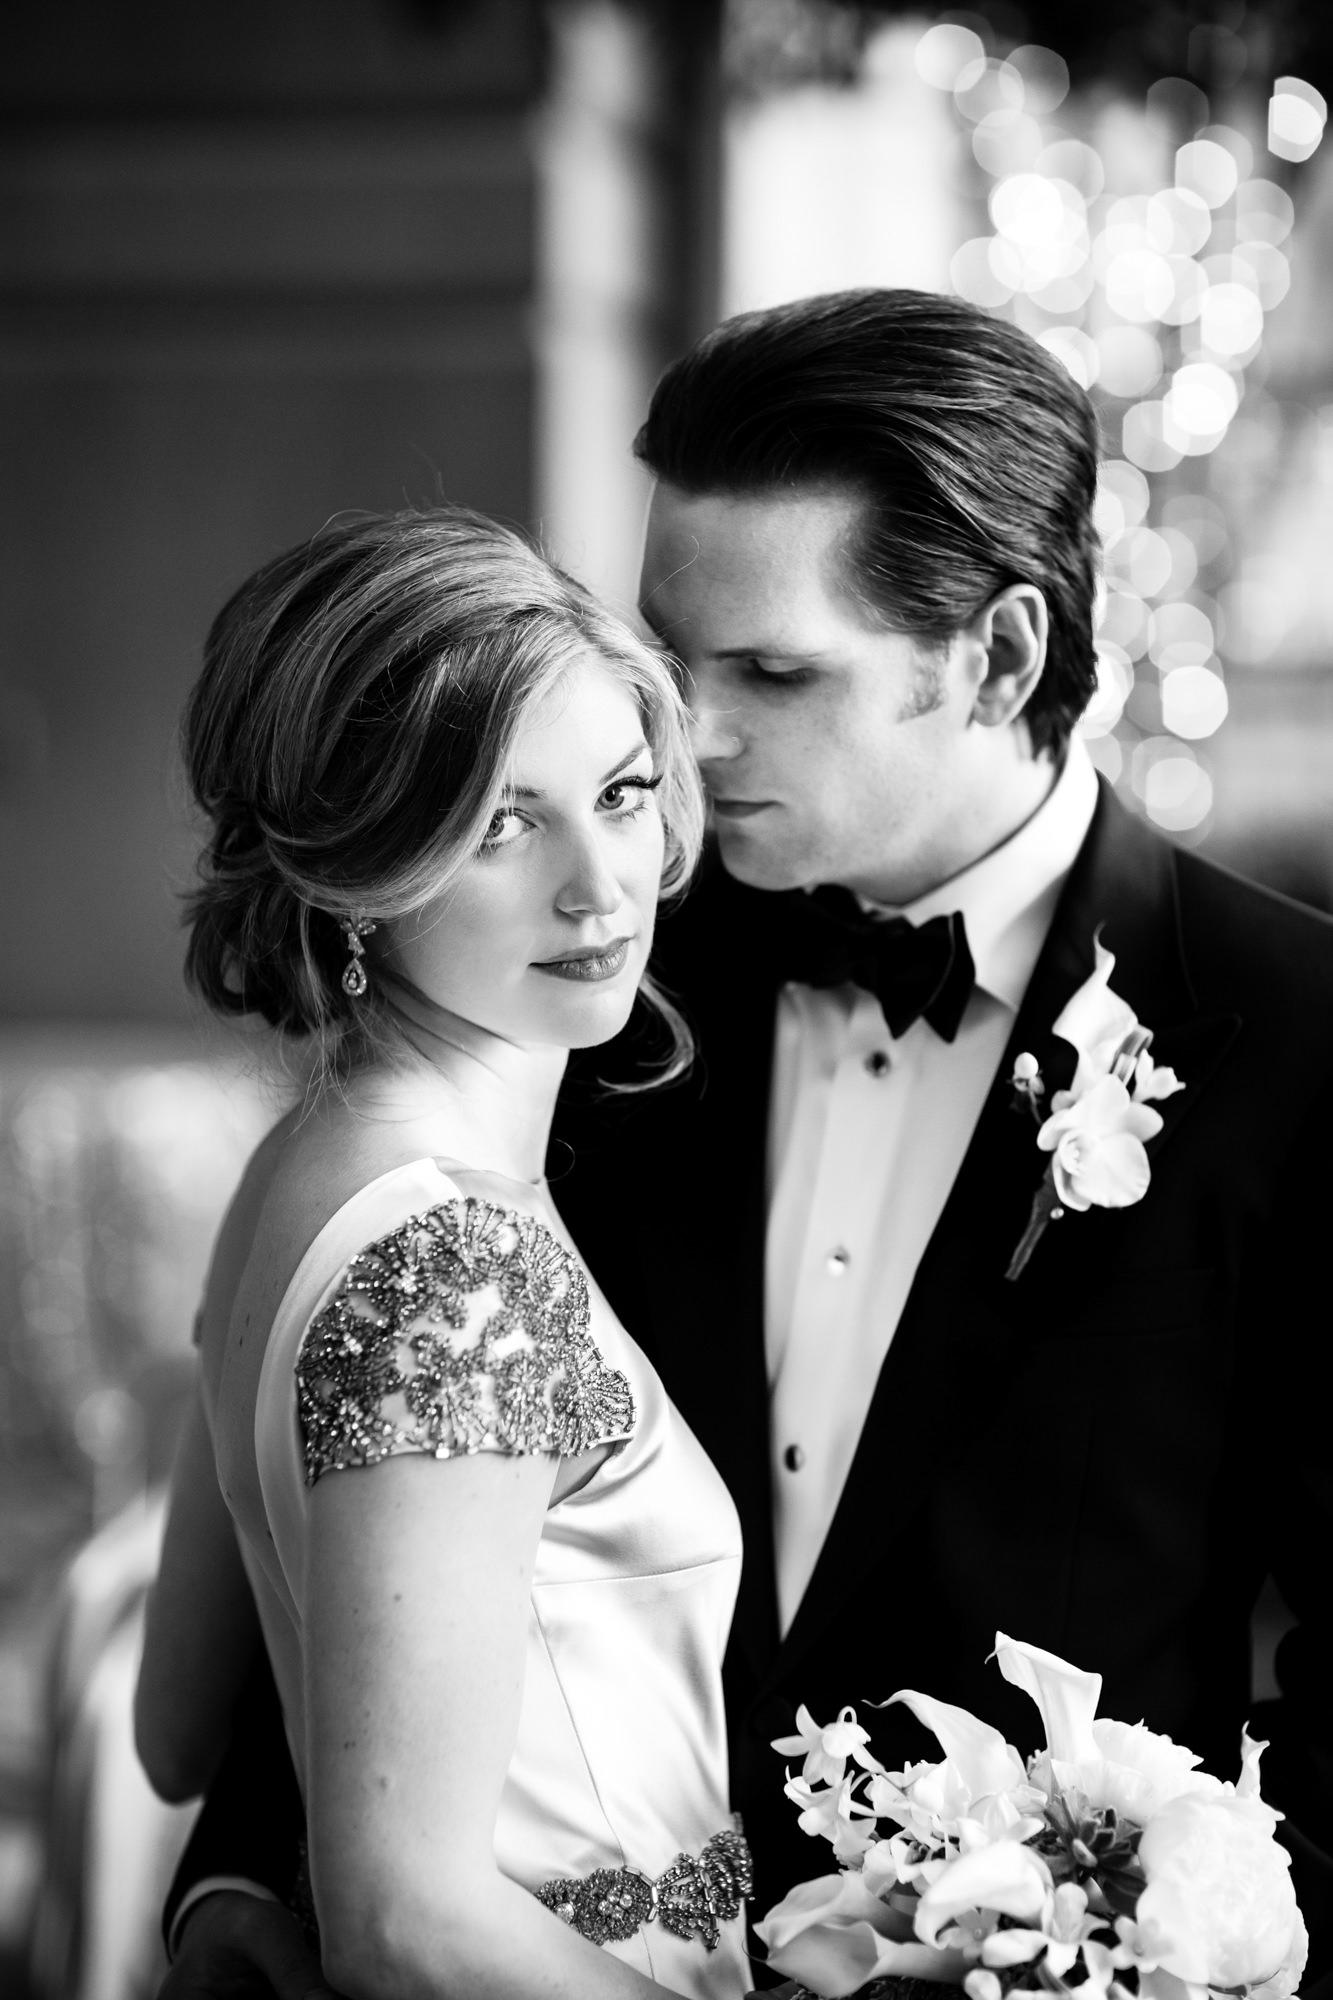 blonde-bride-with-brunette-groom-crystal-short-sleeved-gown-worlds-best-wedding-photos-san-juan-island-photographers-la-vie-photo